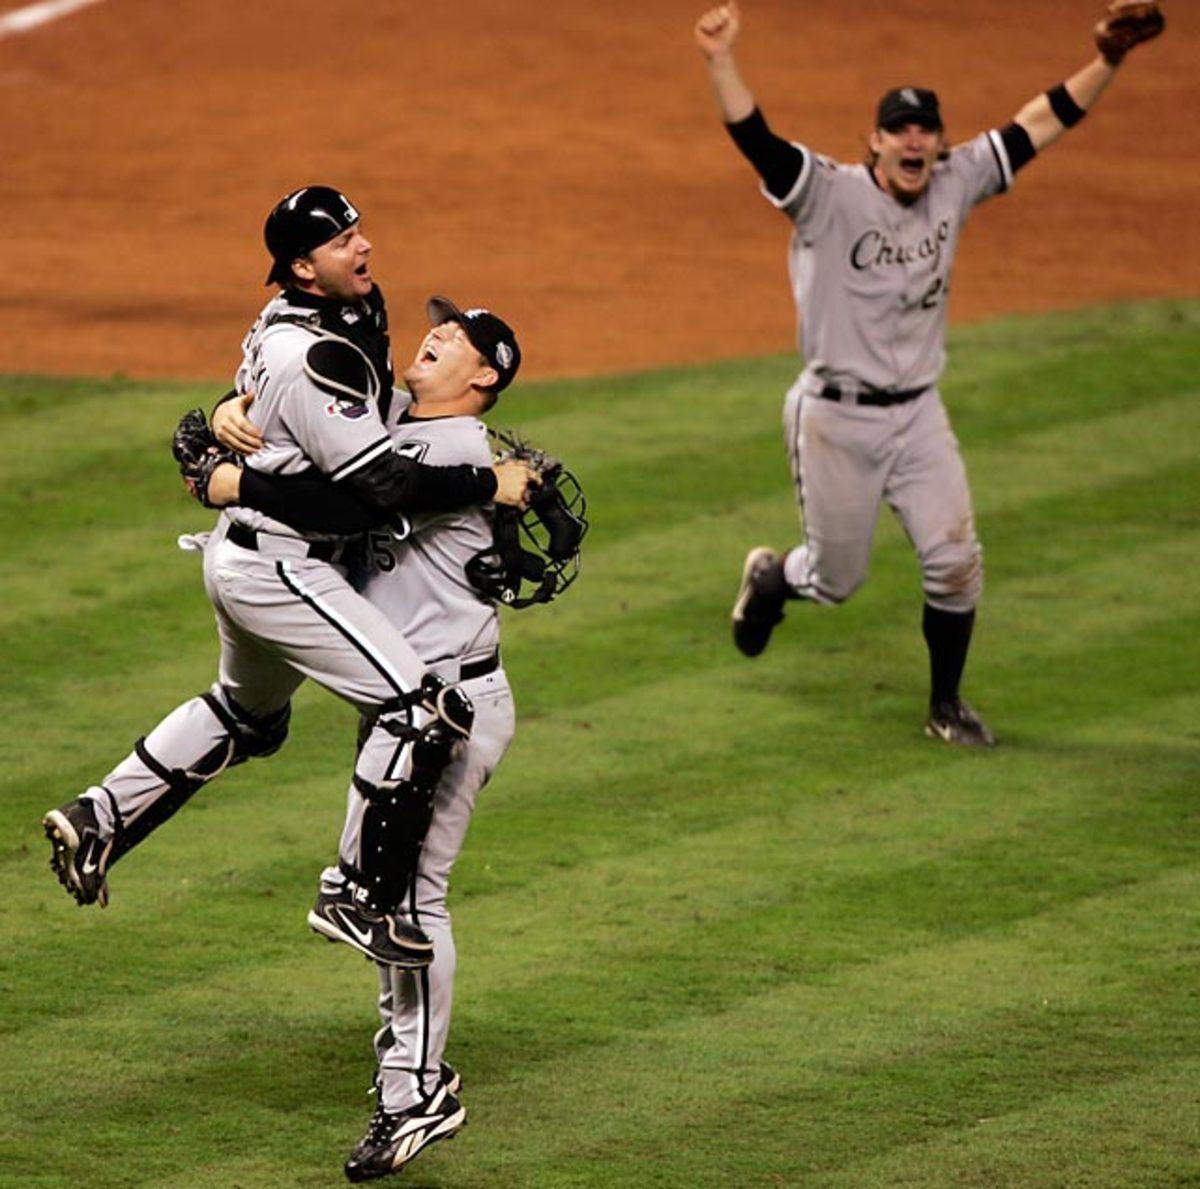 White Sox defeat Astros, 4-0